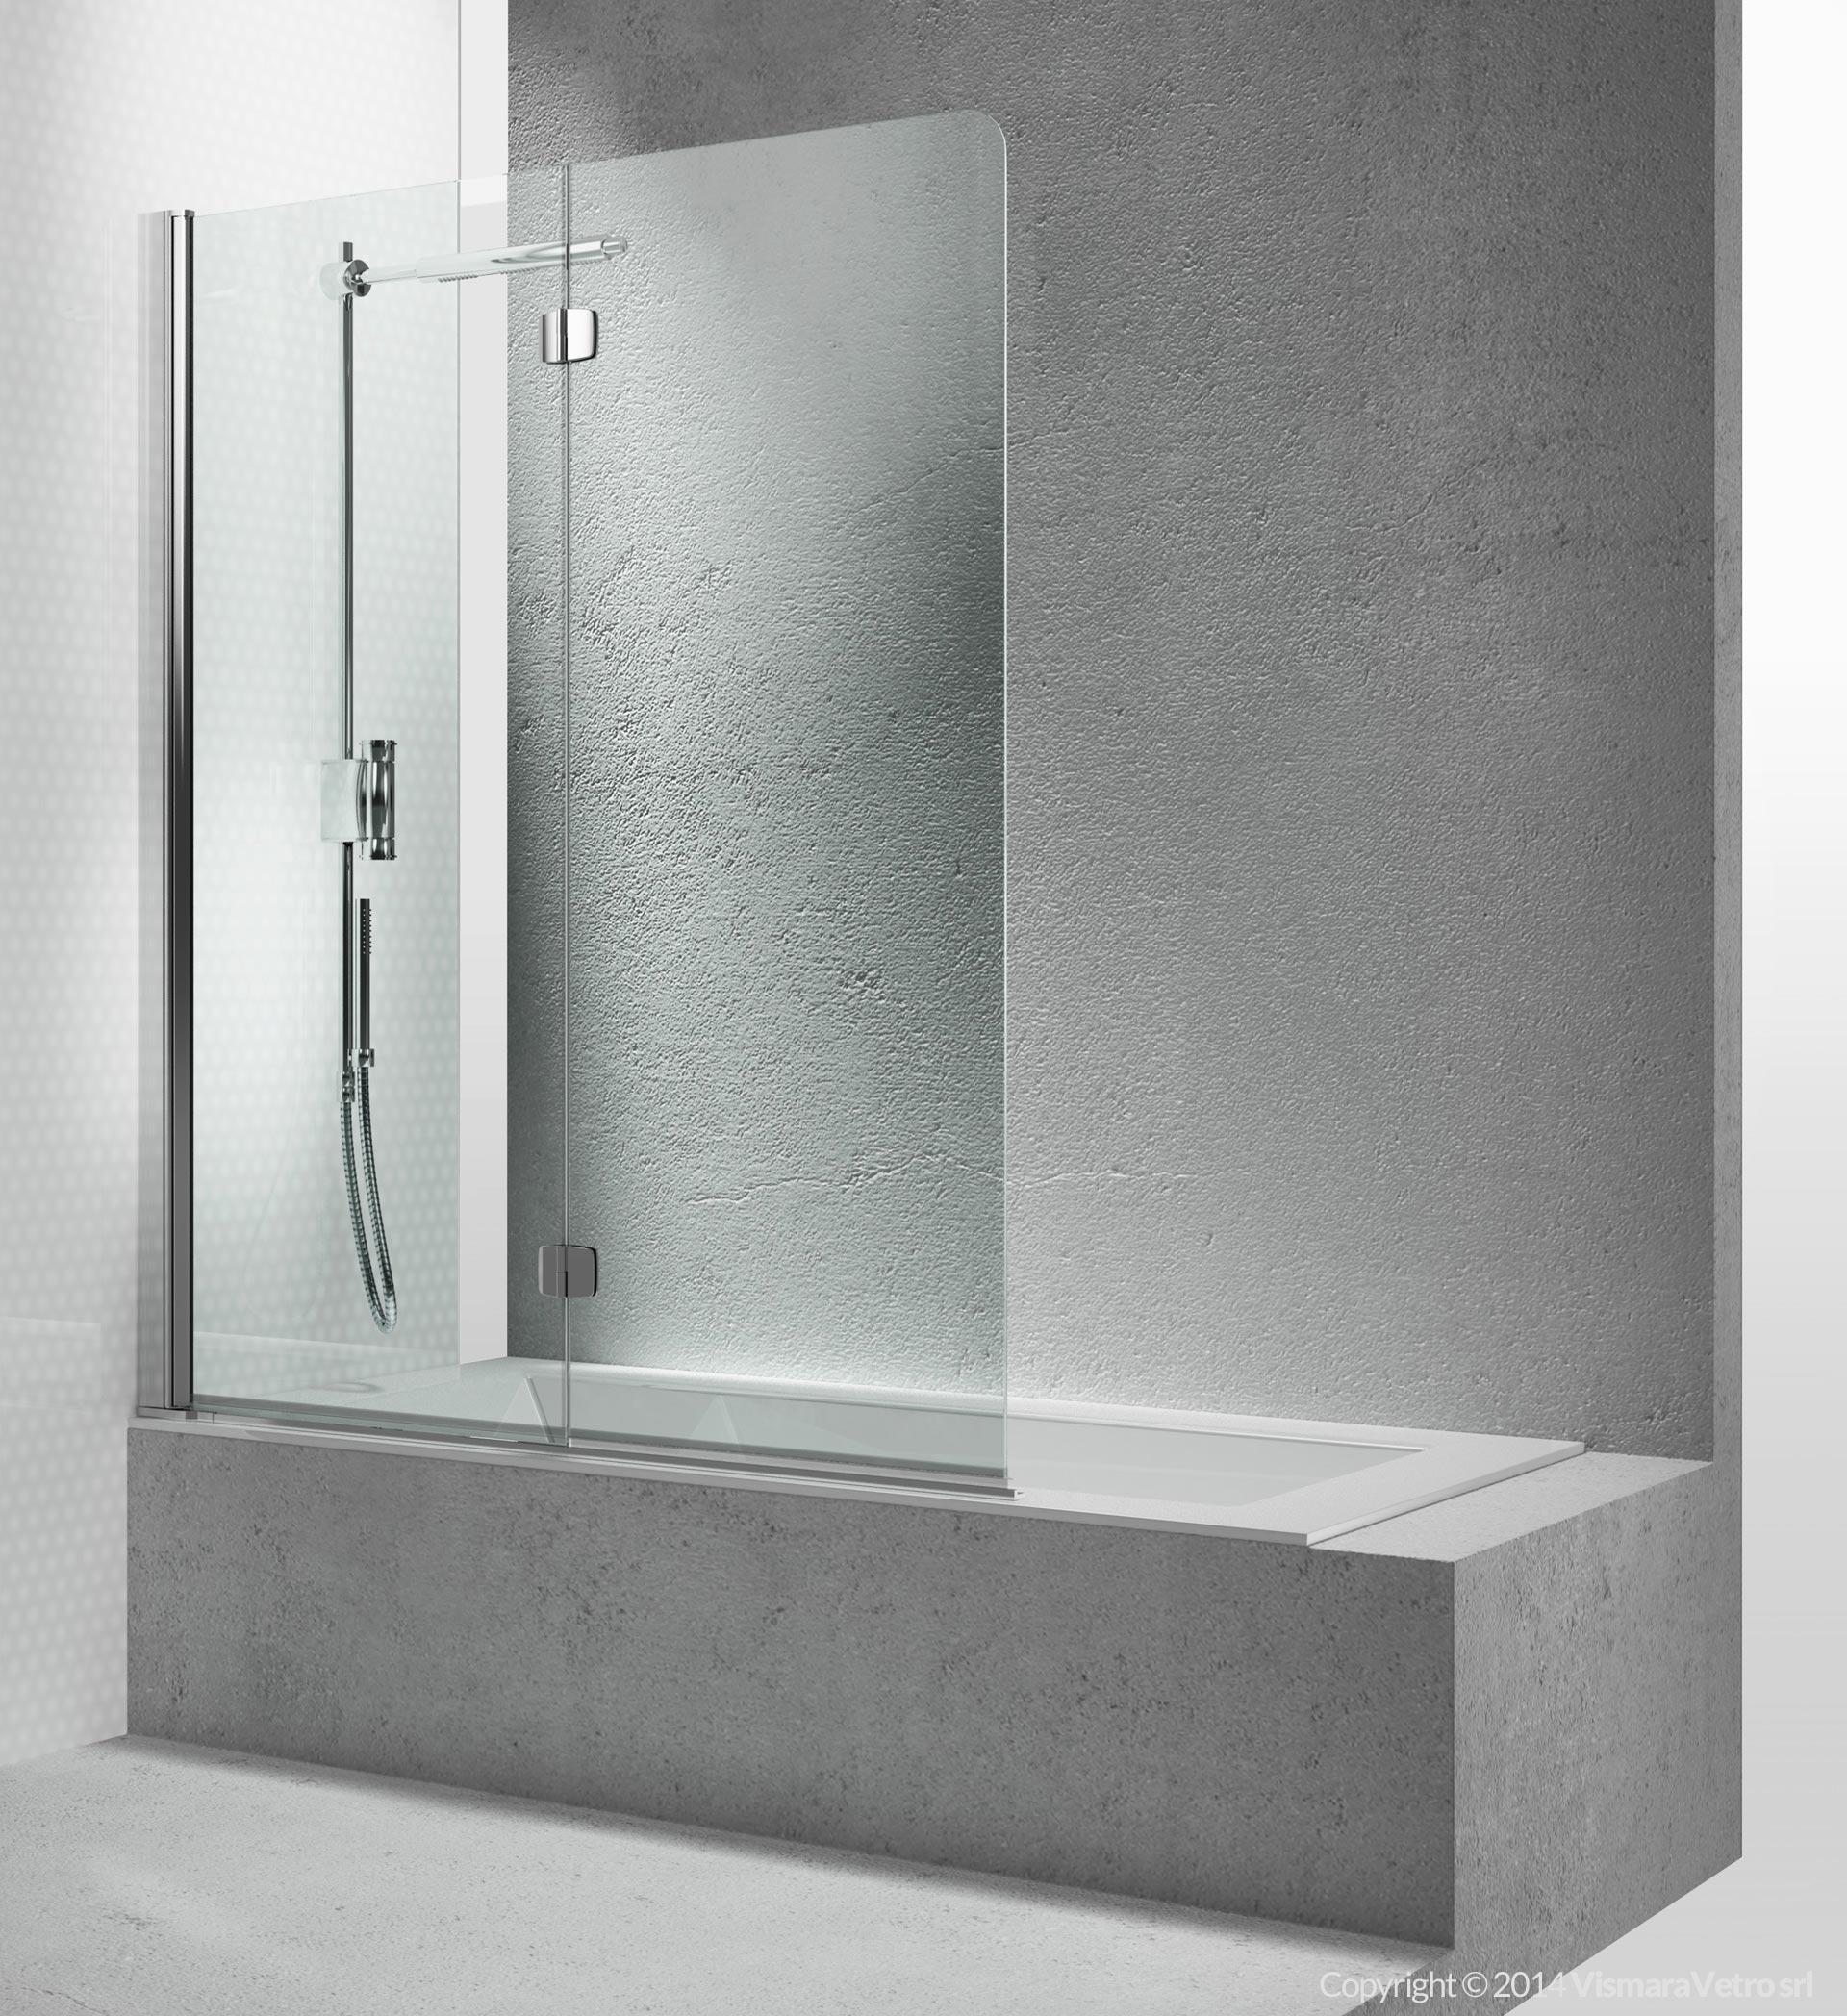 Sv aura concept cuisine salle de bain spa - Copri vasca da bagno ikea ...